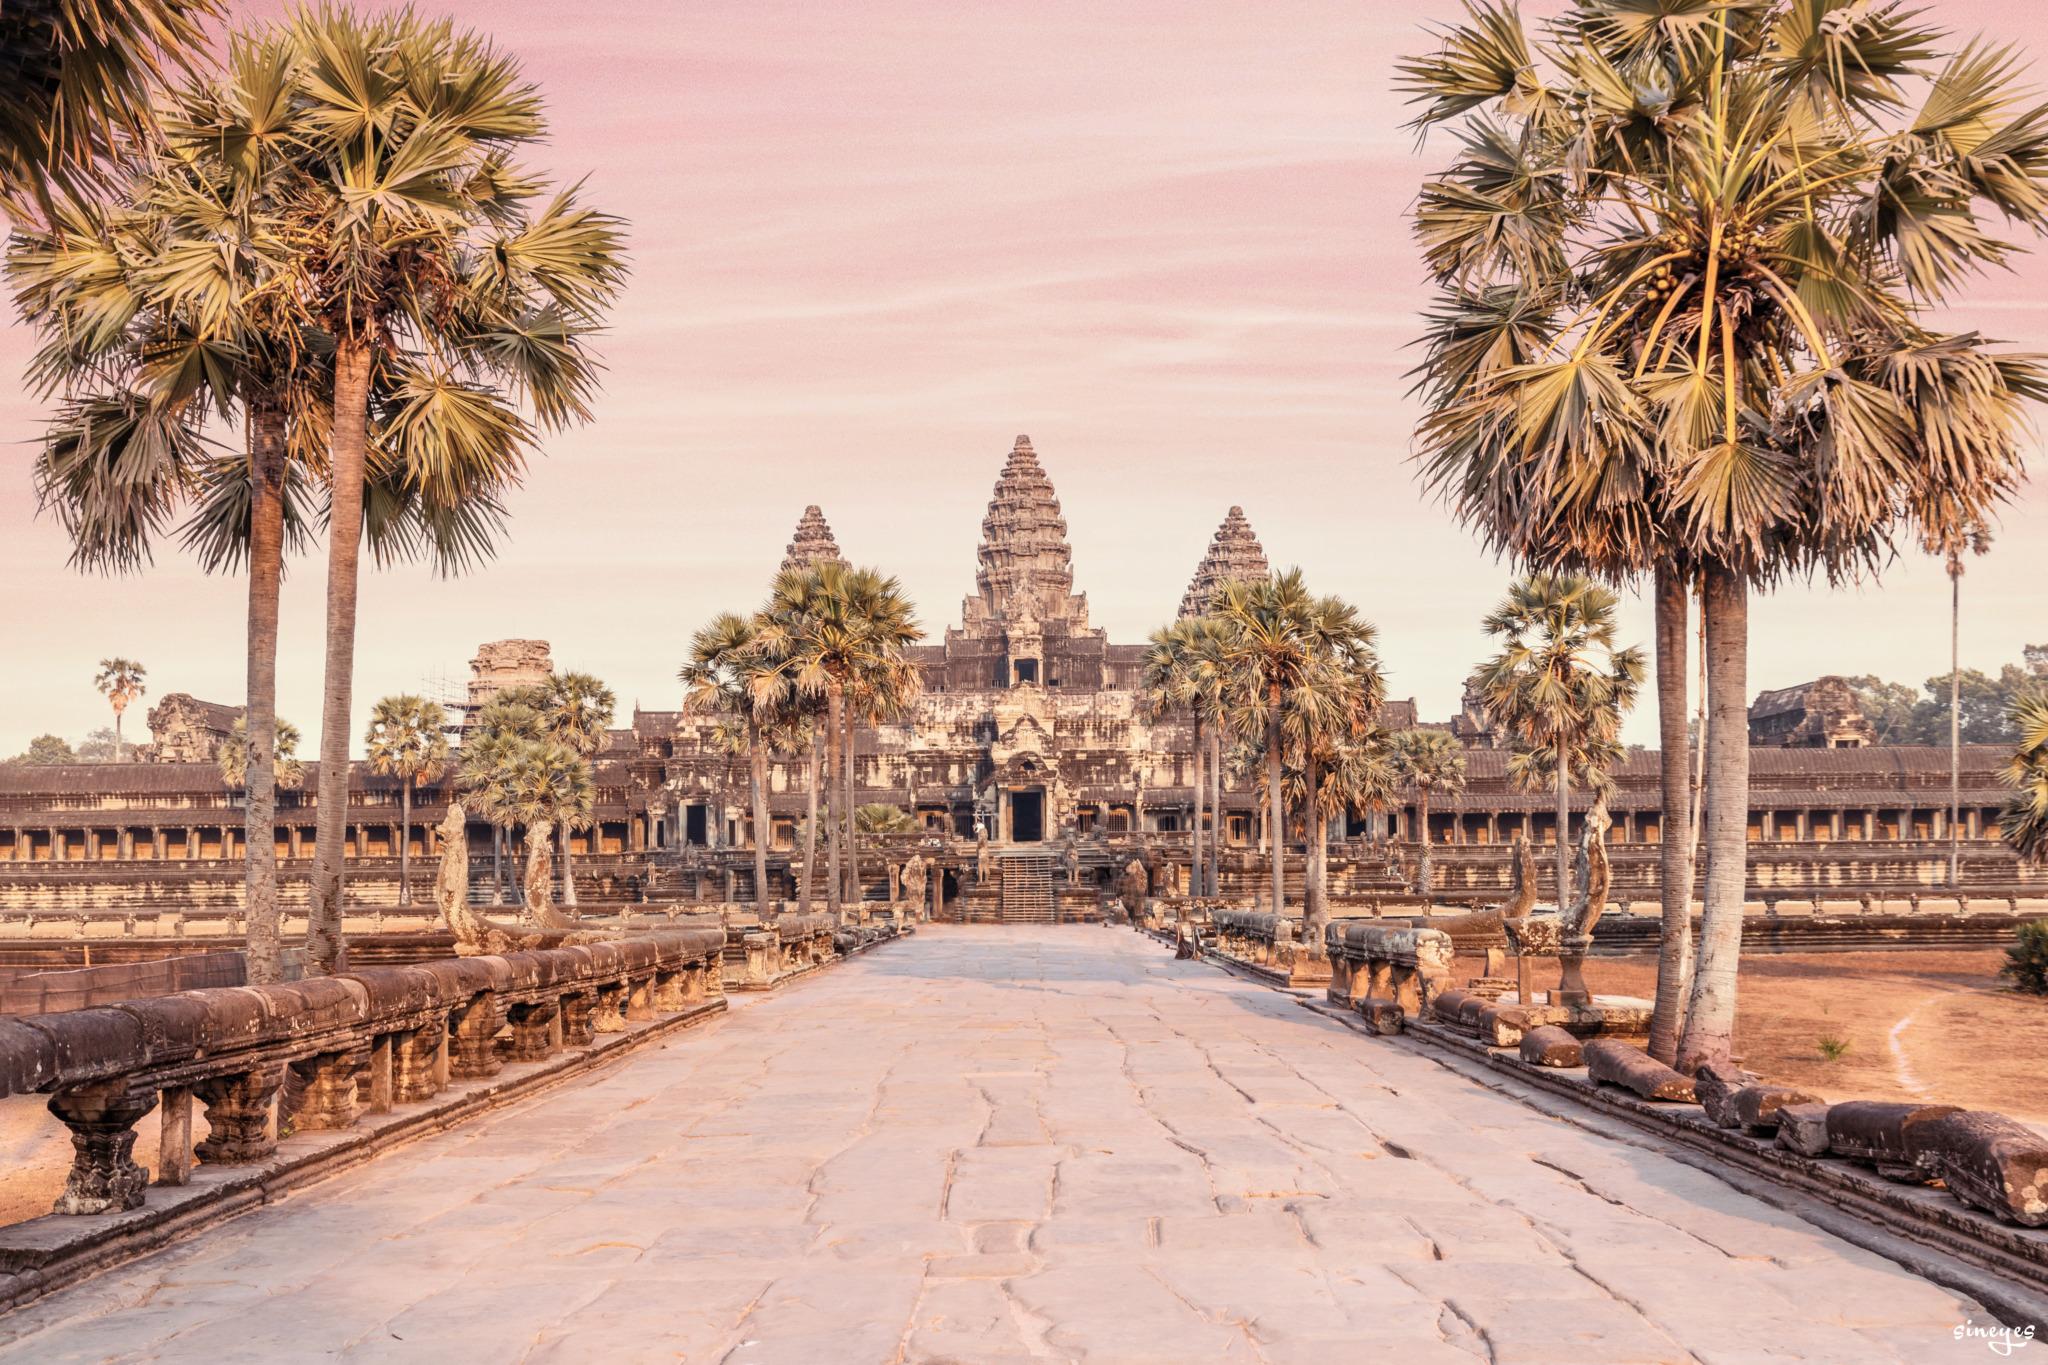 Angkor by sineyes